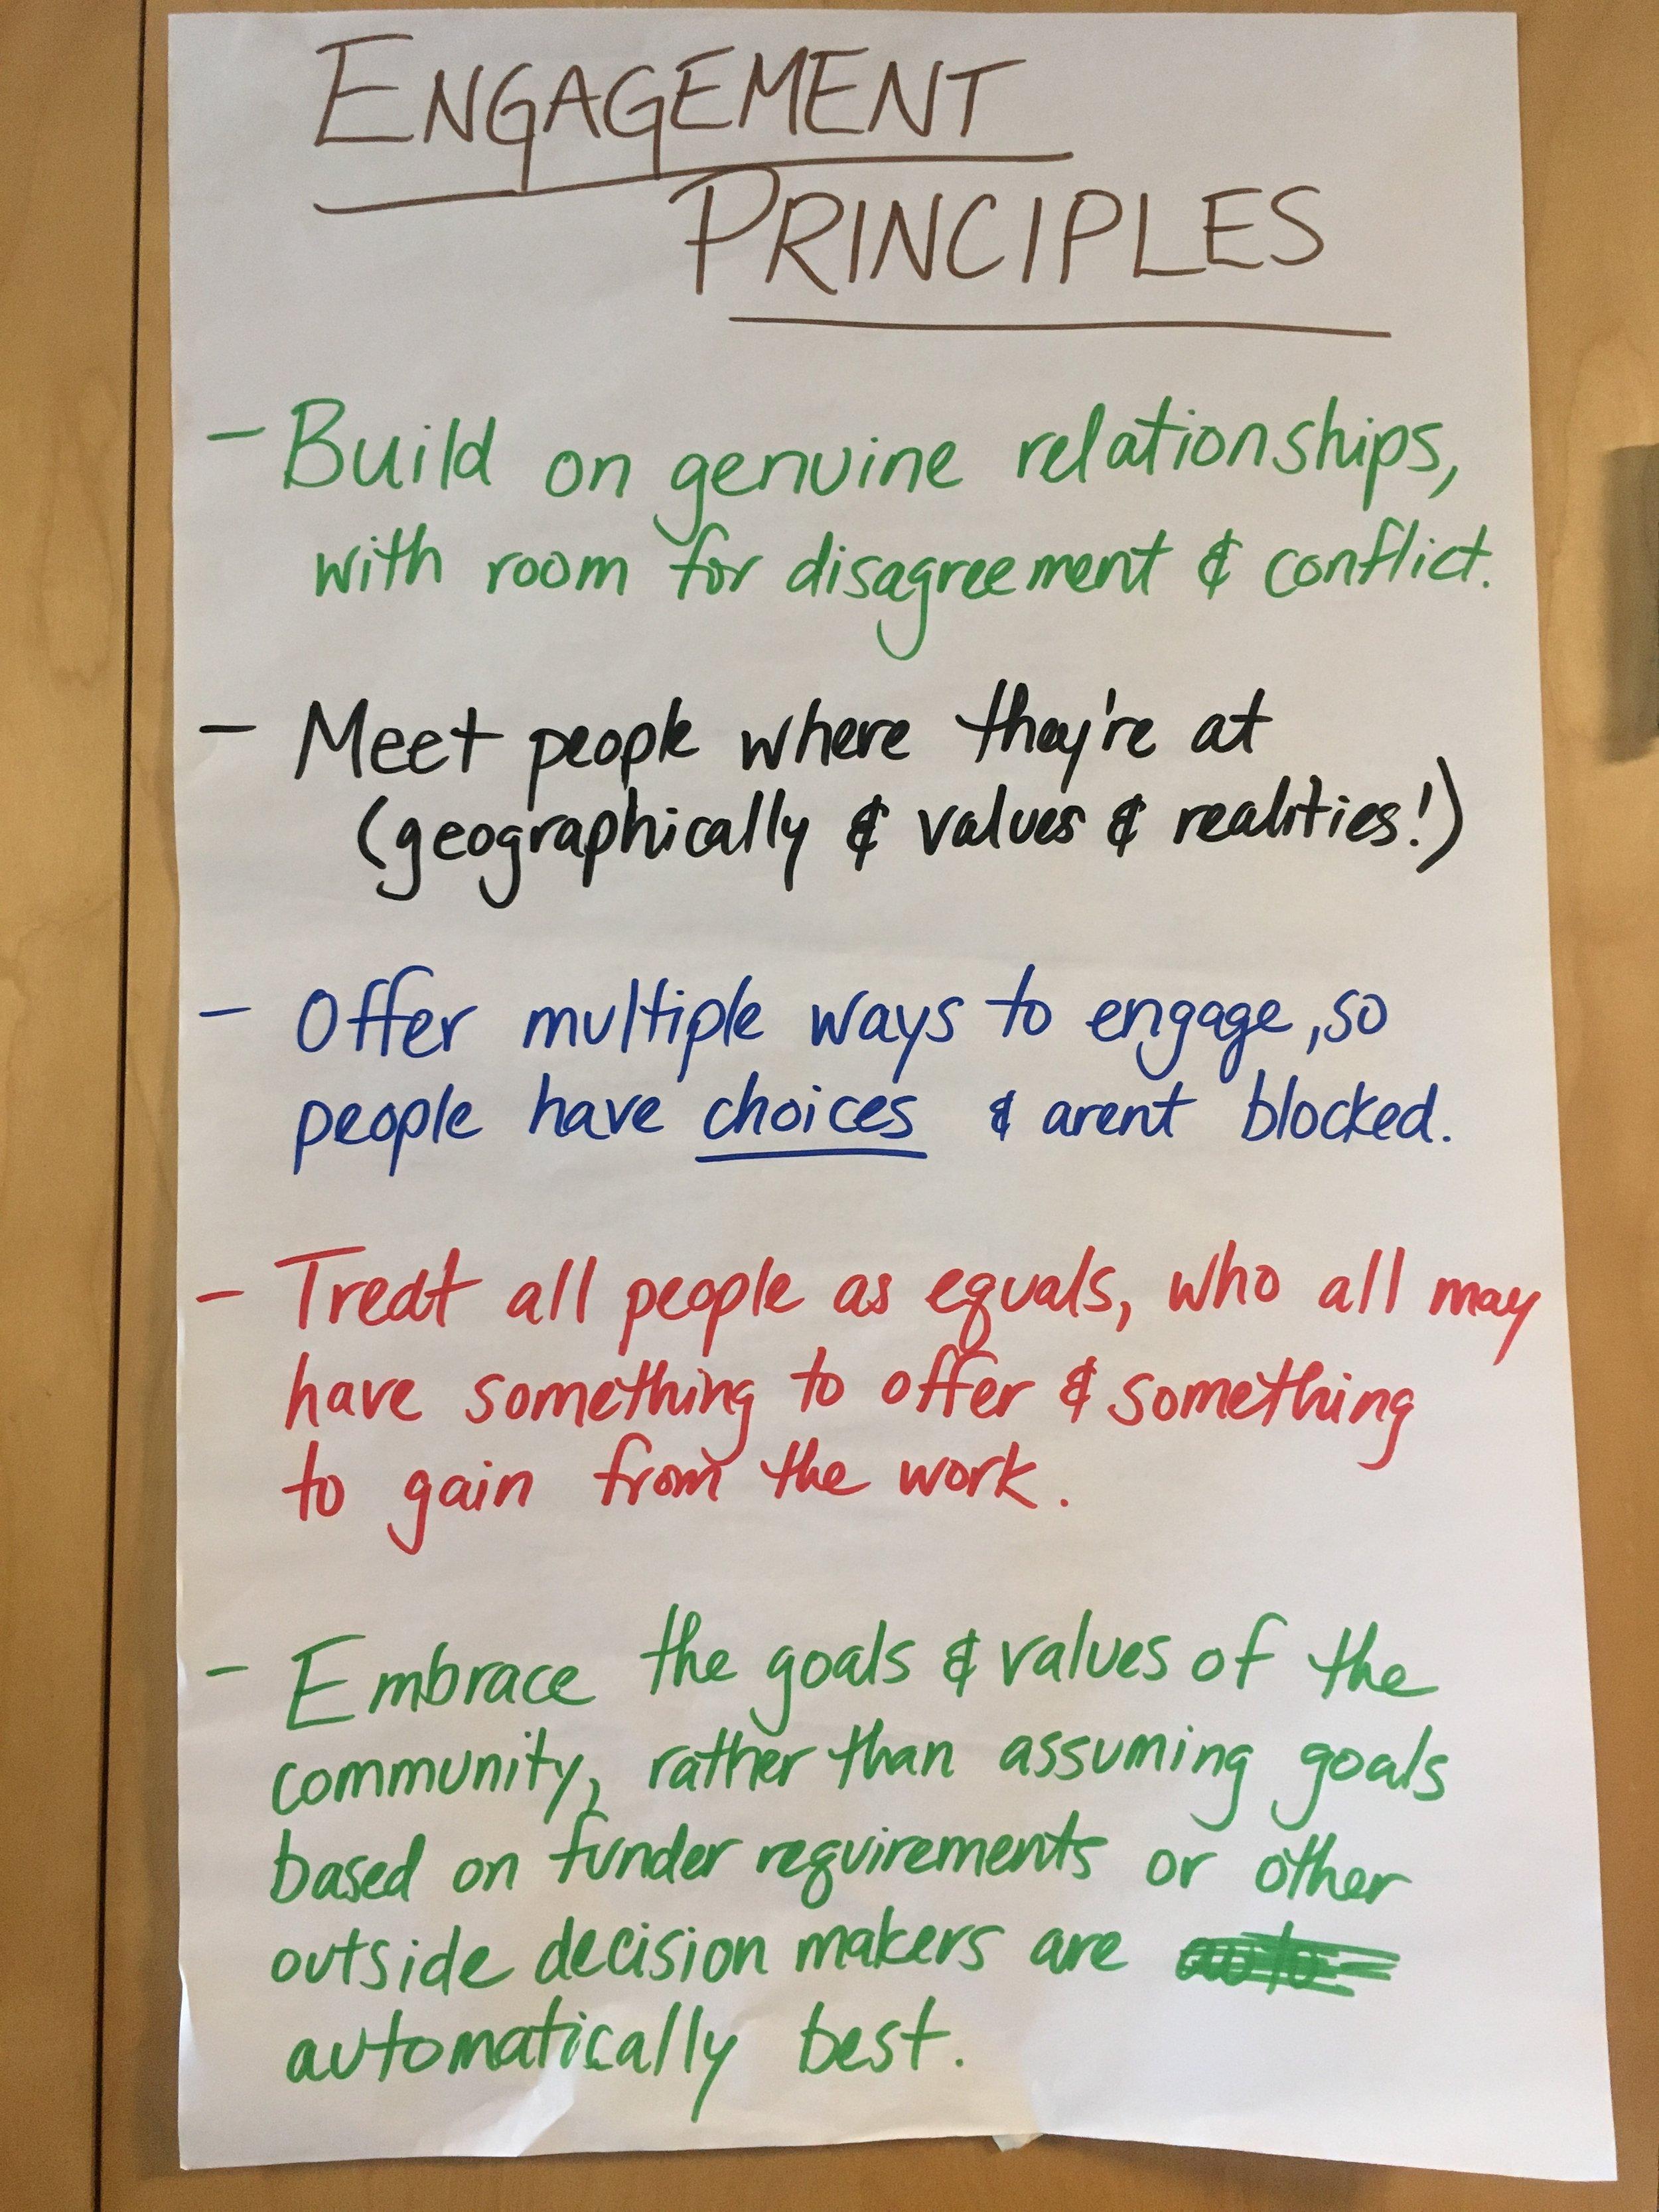 Our key engagement principles.